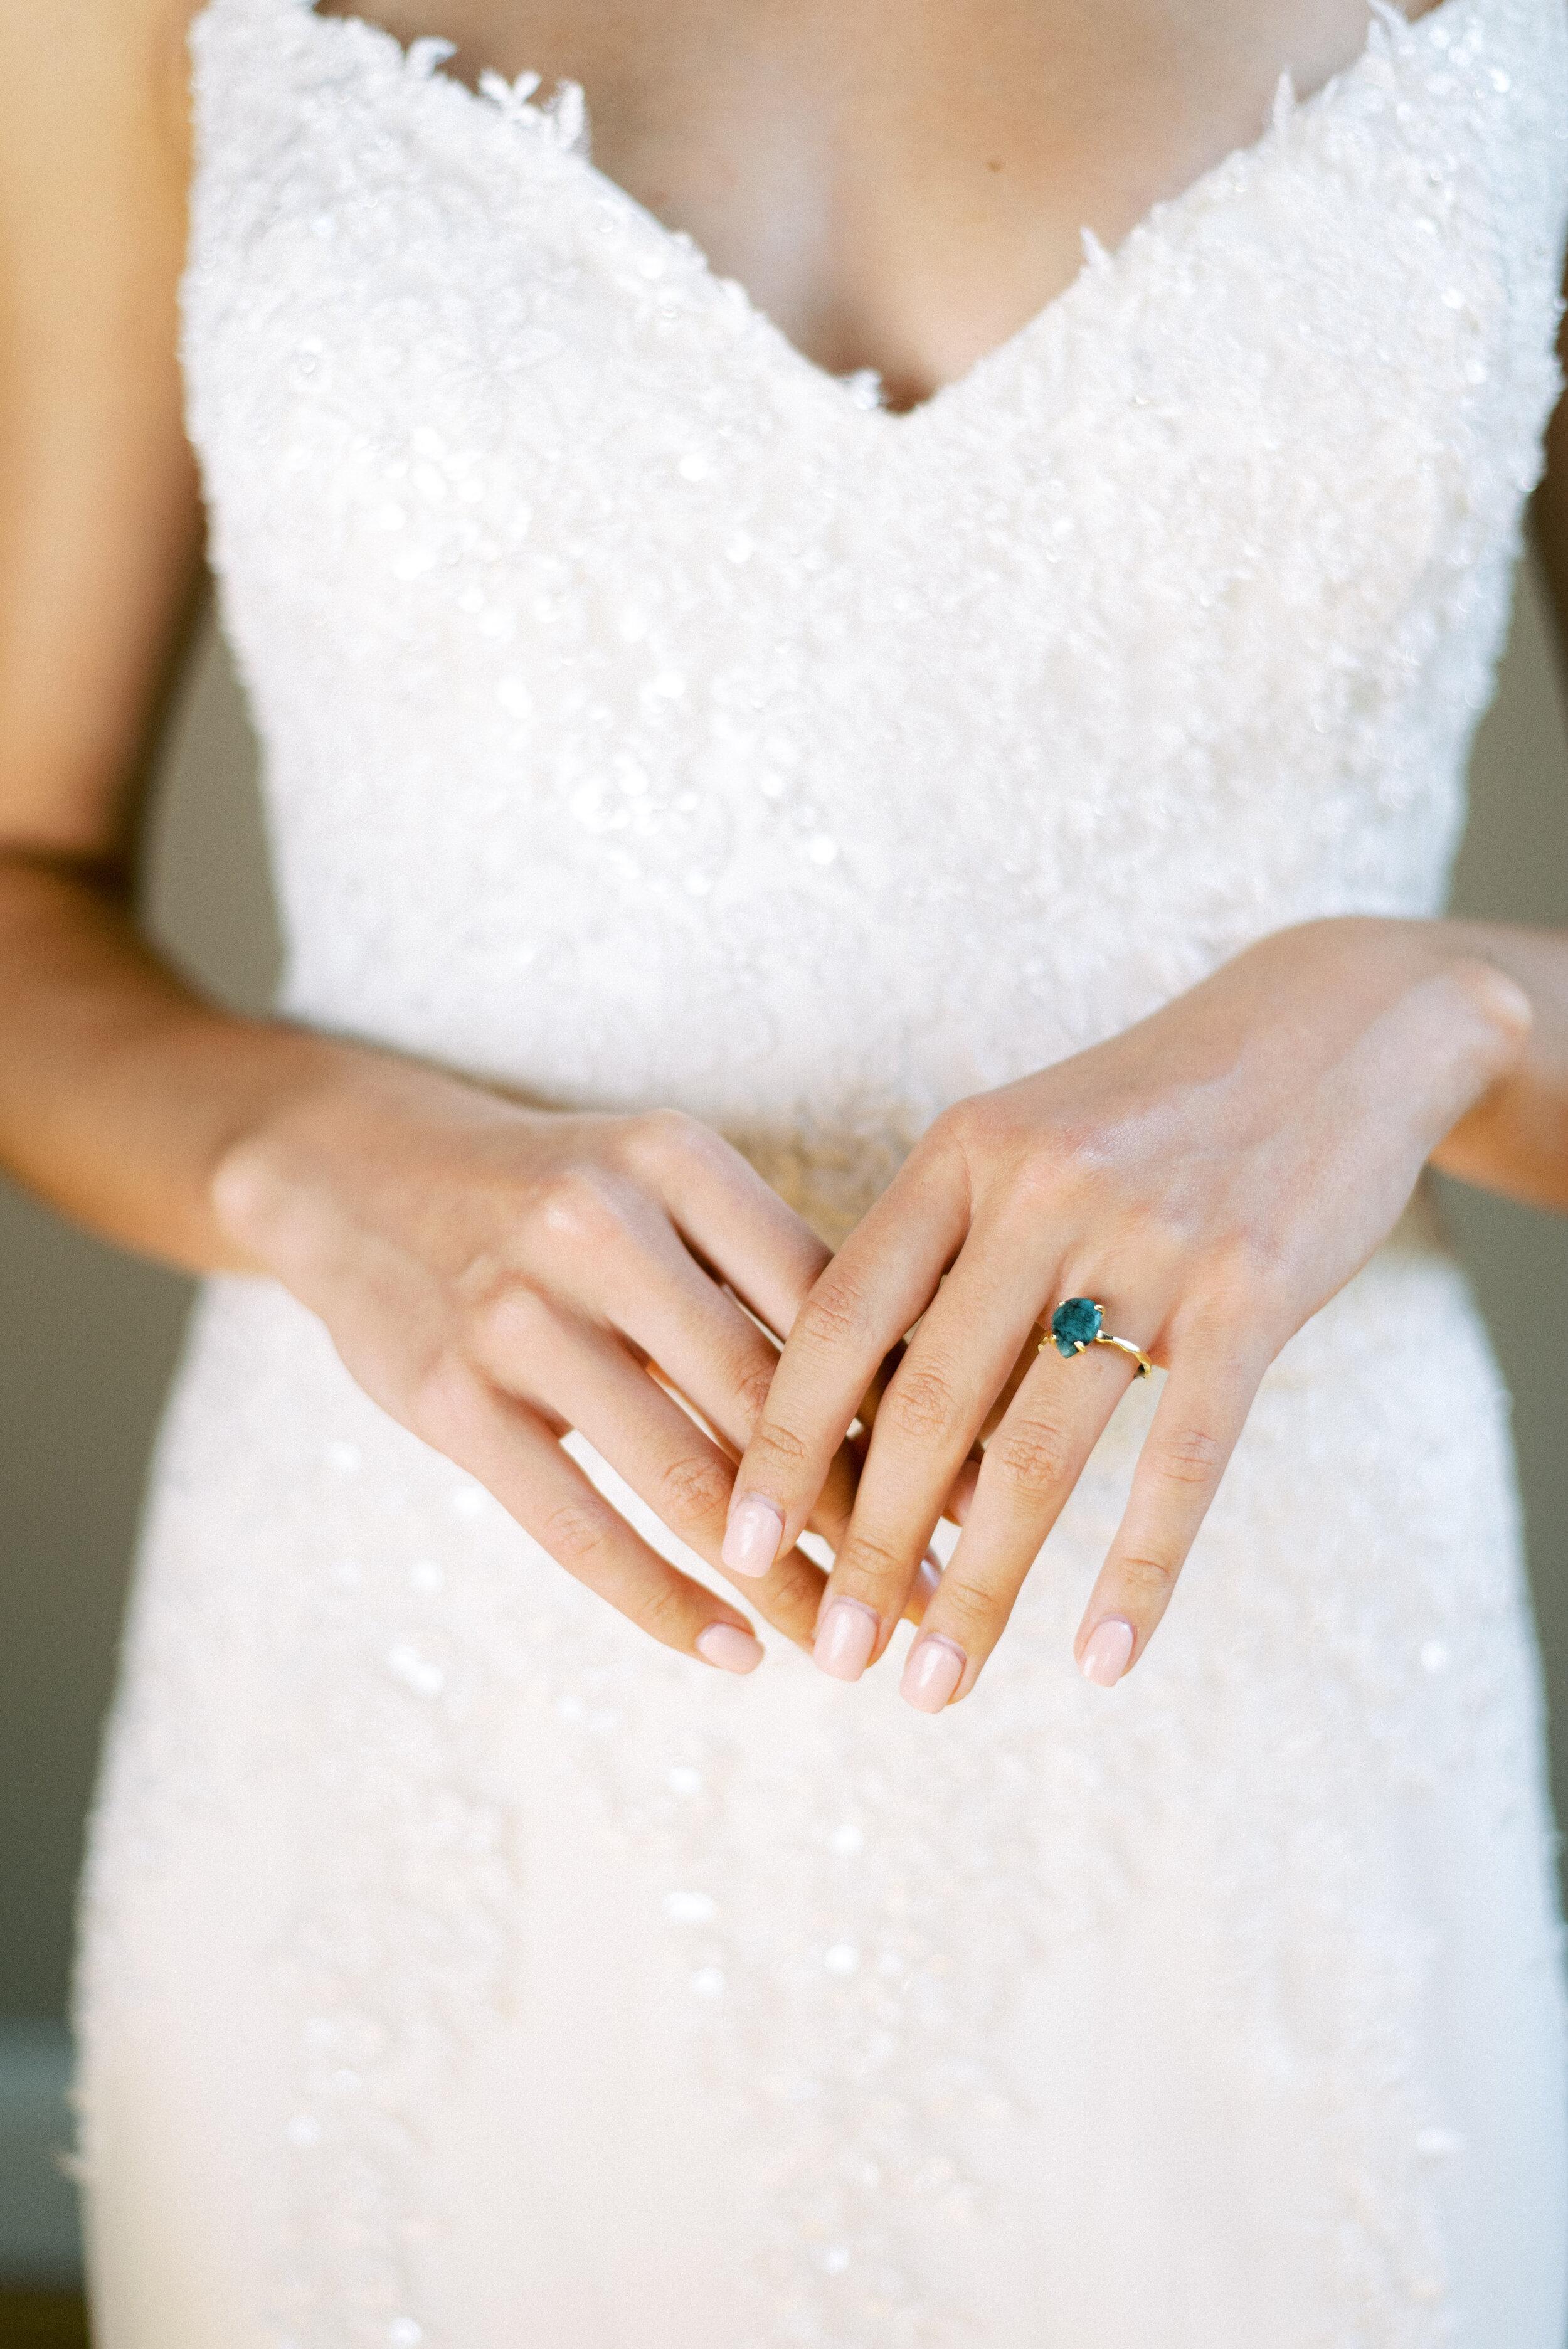 Bibb_Mill_Wedding_Editorial_Columbus_Georgia_Fallen_Photography_1 (36).JPG